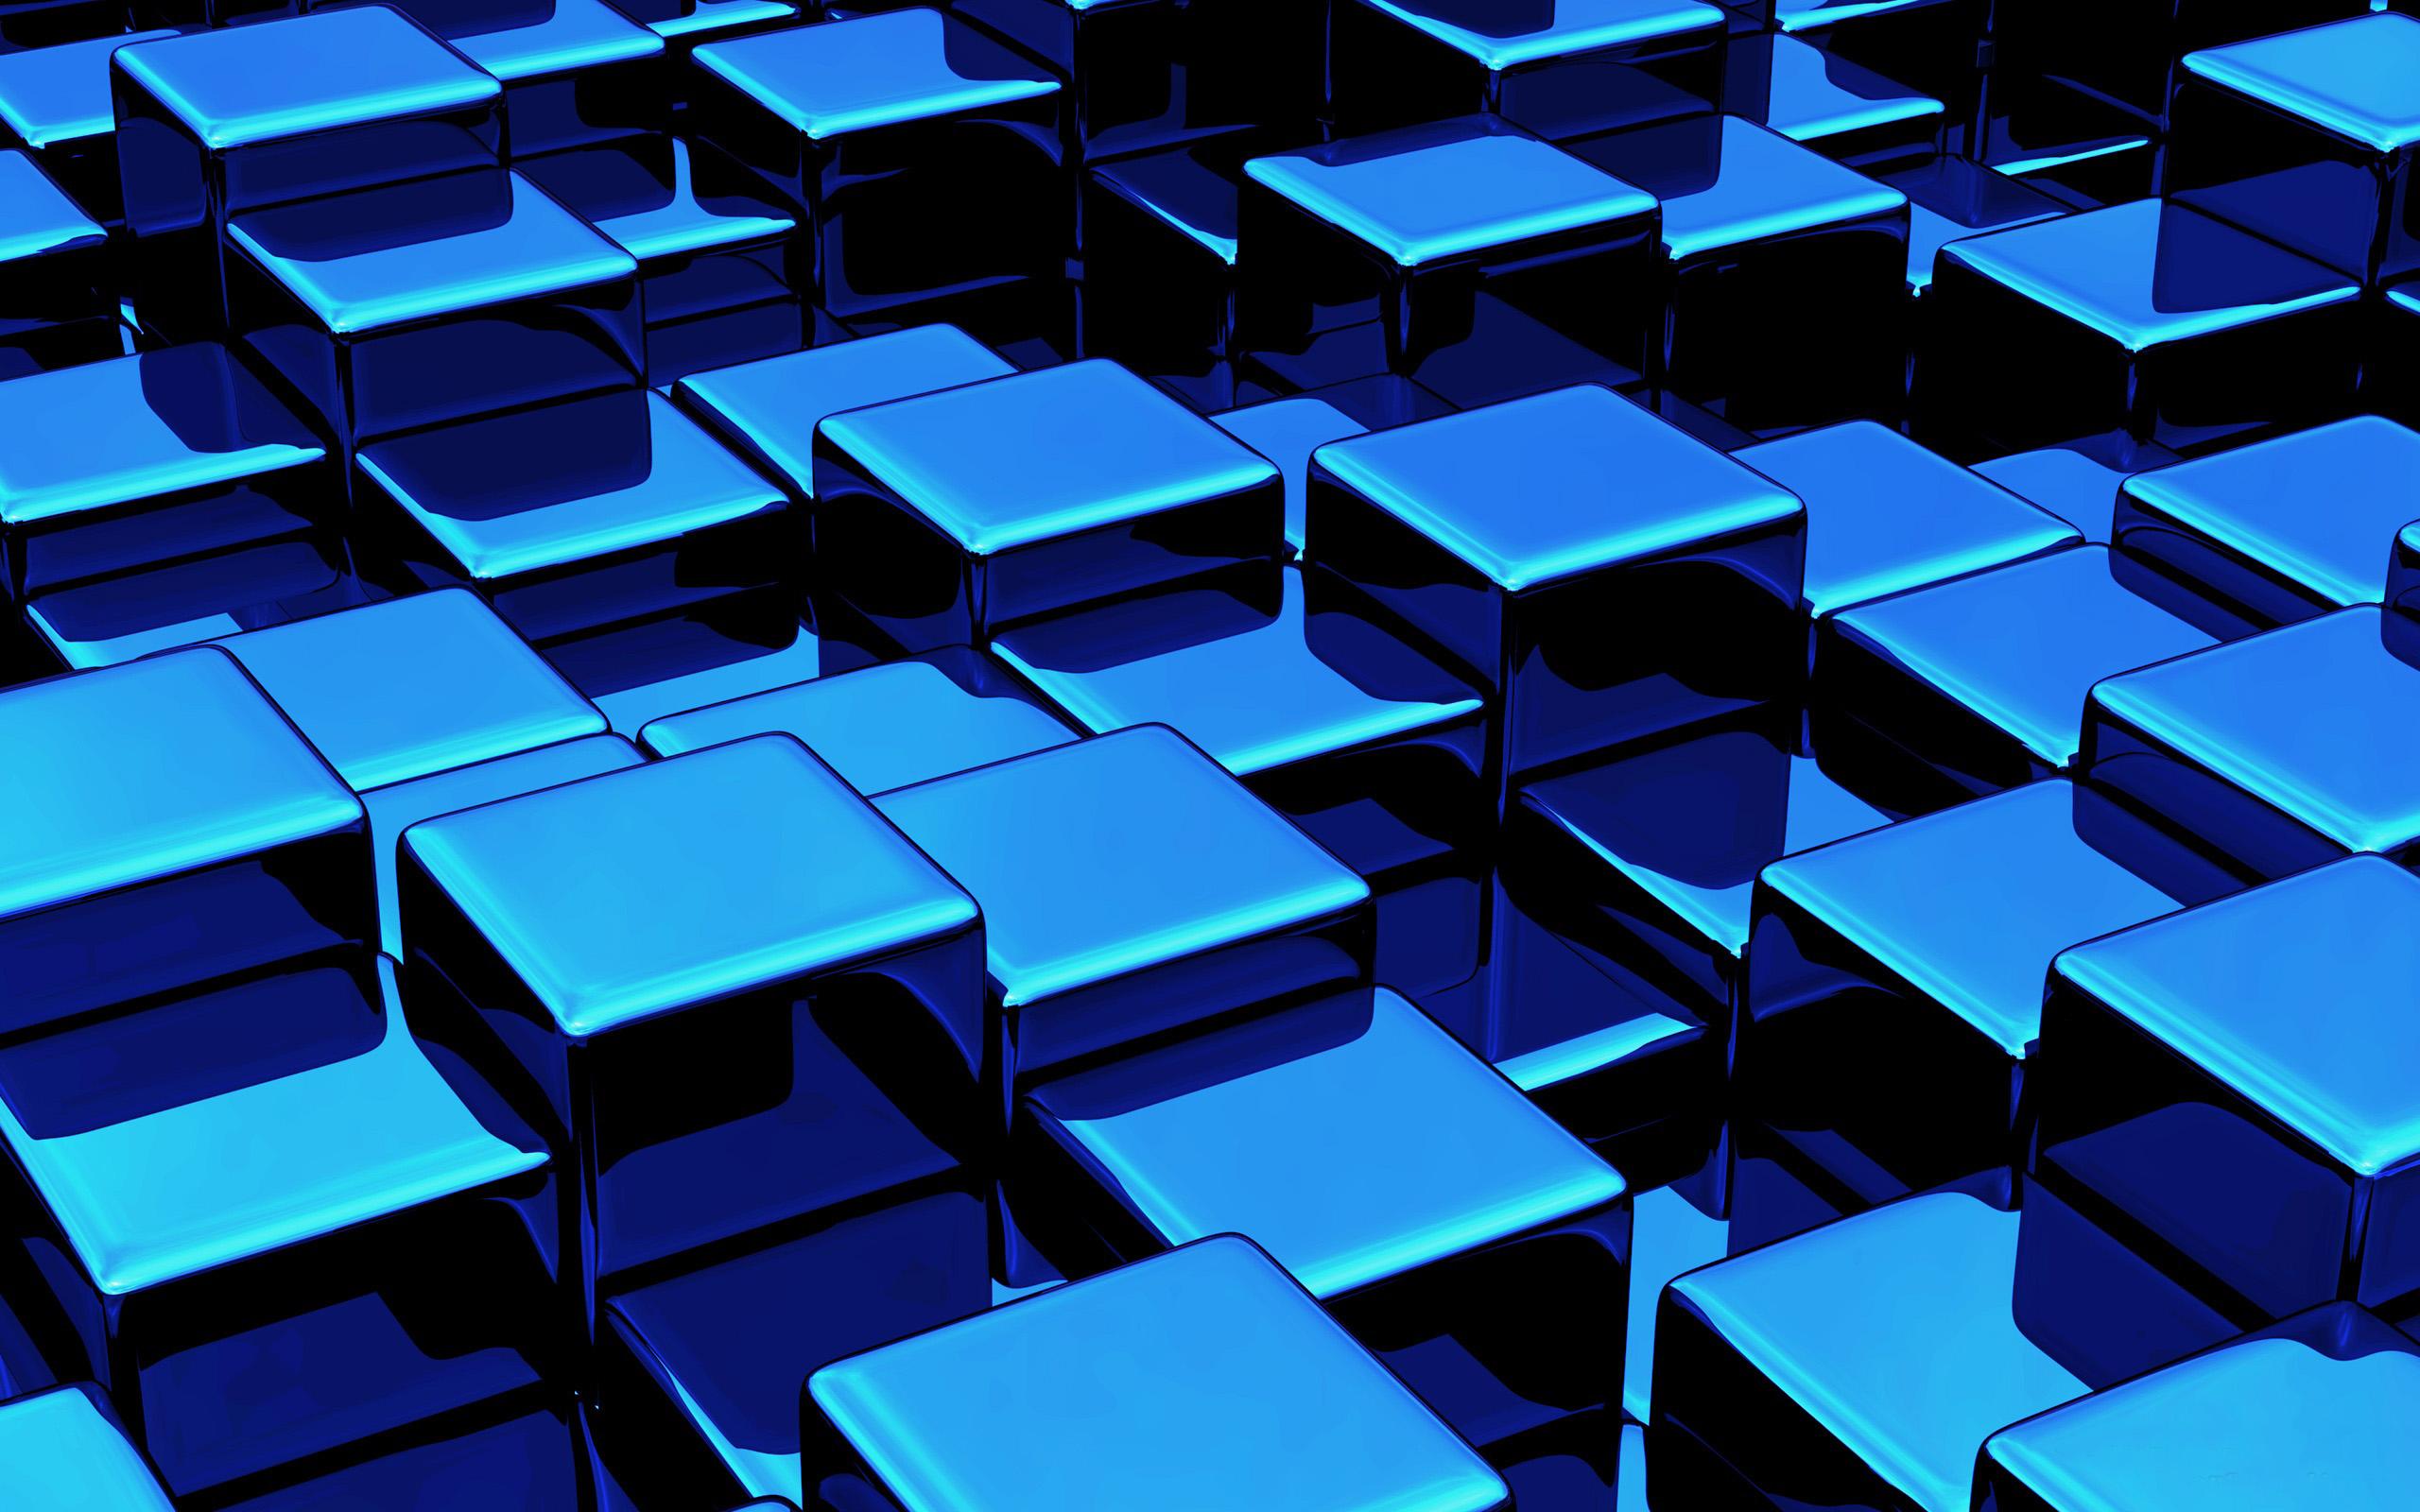 Blue Cube Wallpaper